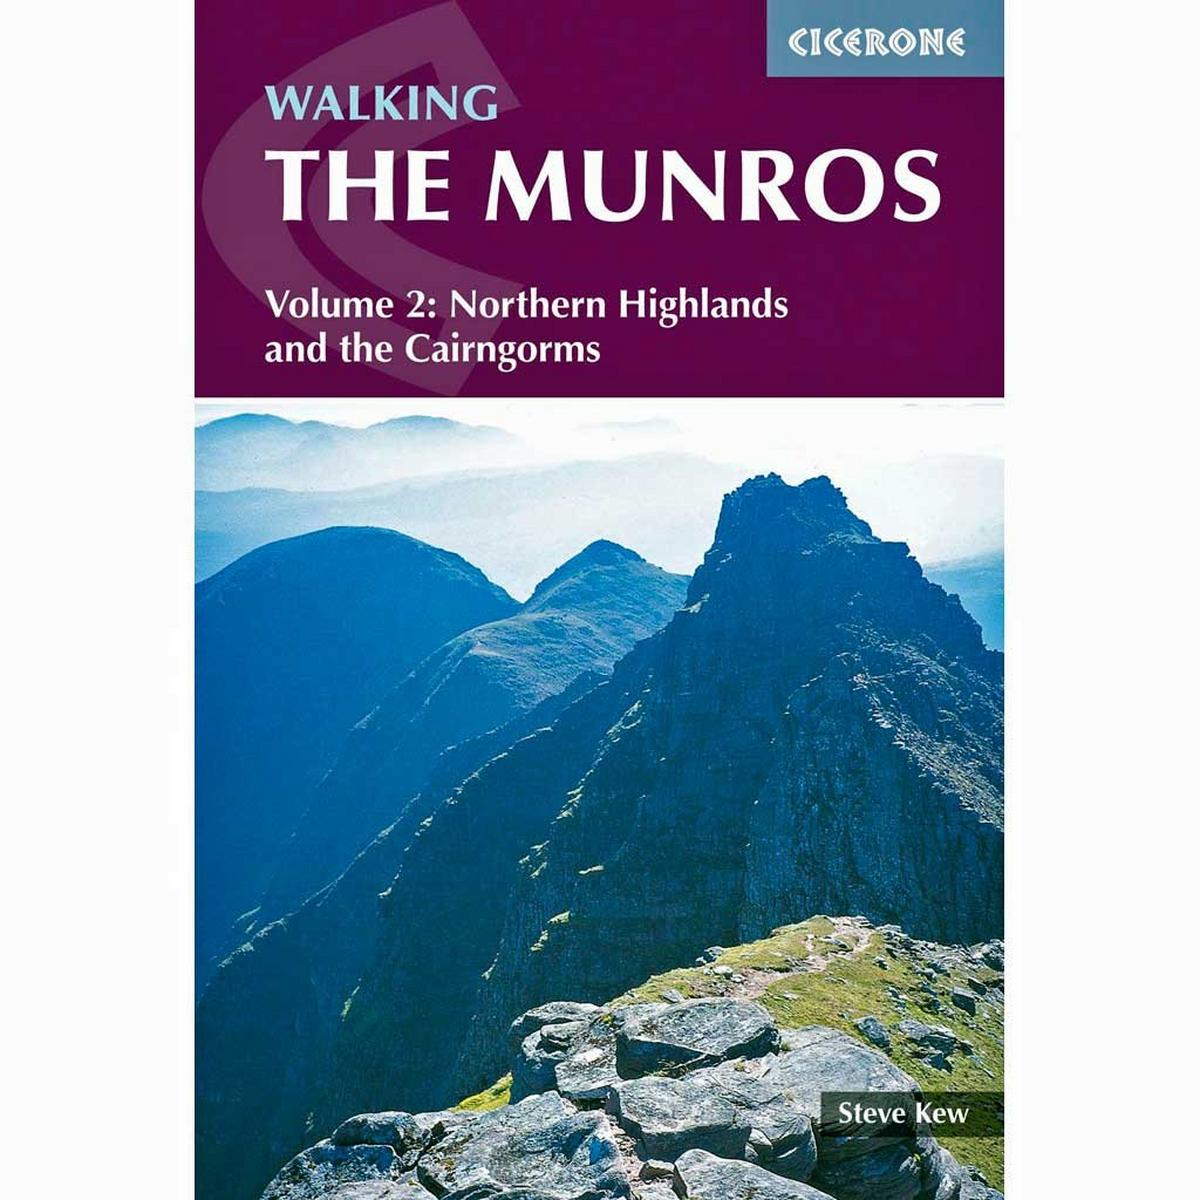 Cicerone Guide Book: Walking the Munros Volume 2